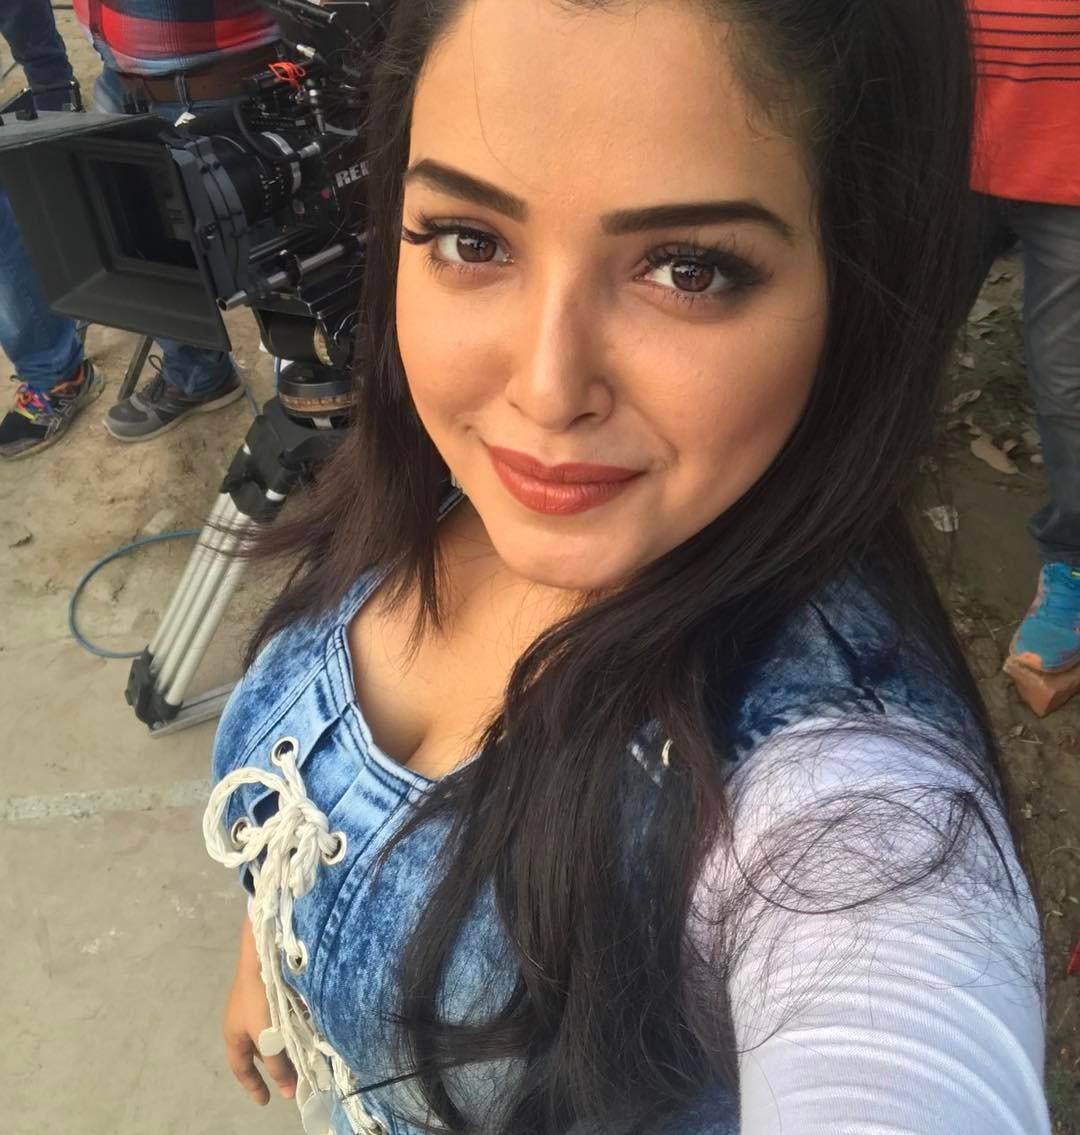 Amrapali Dubey Cleavage Photos Hot - Actress World-7829